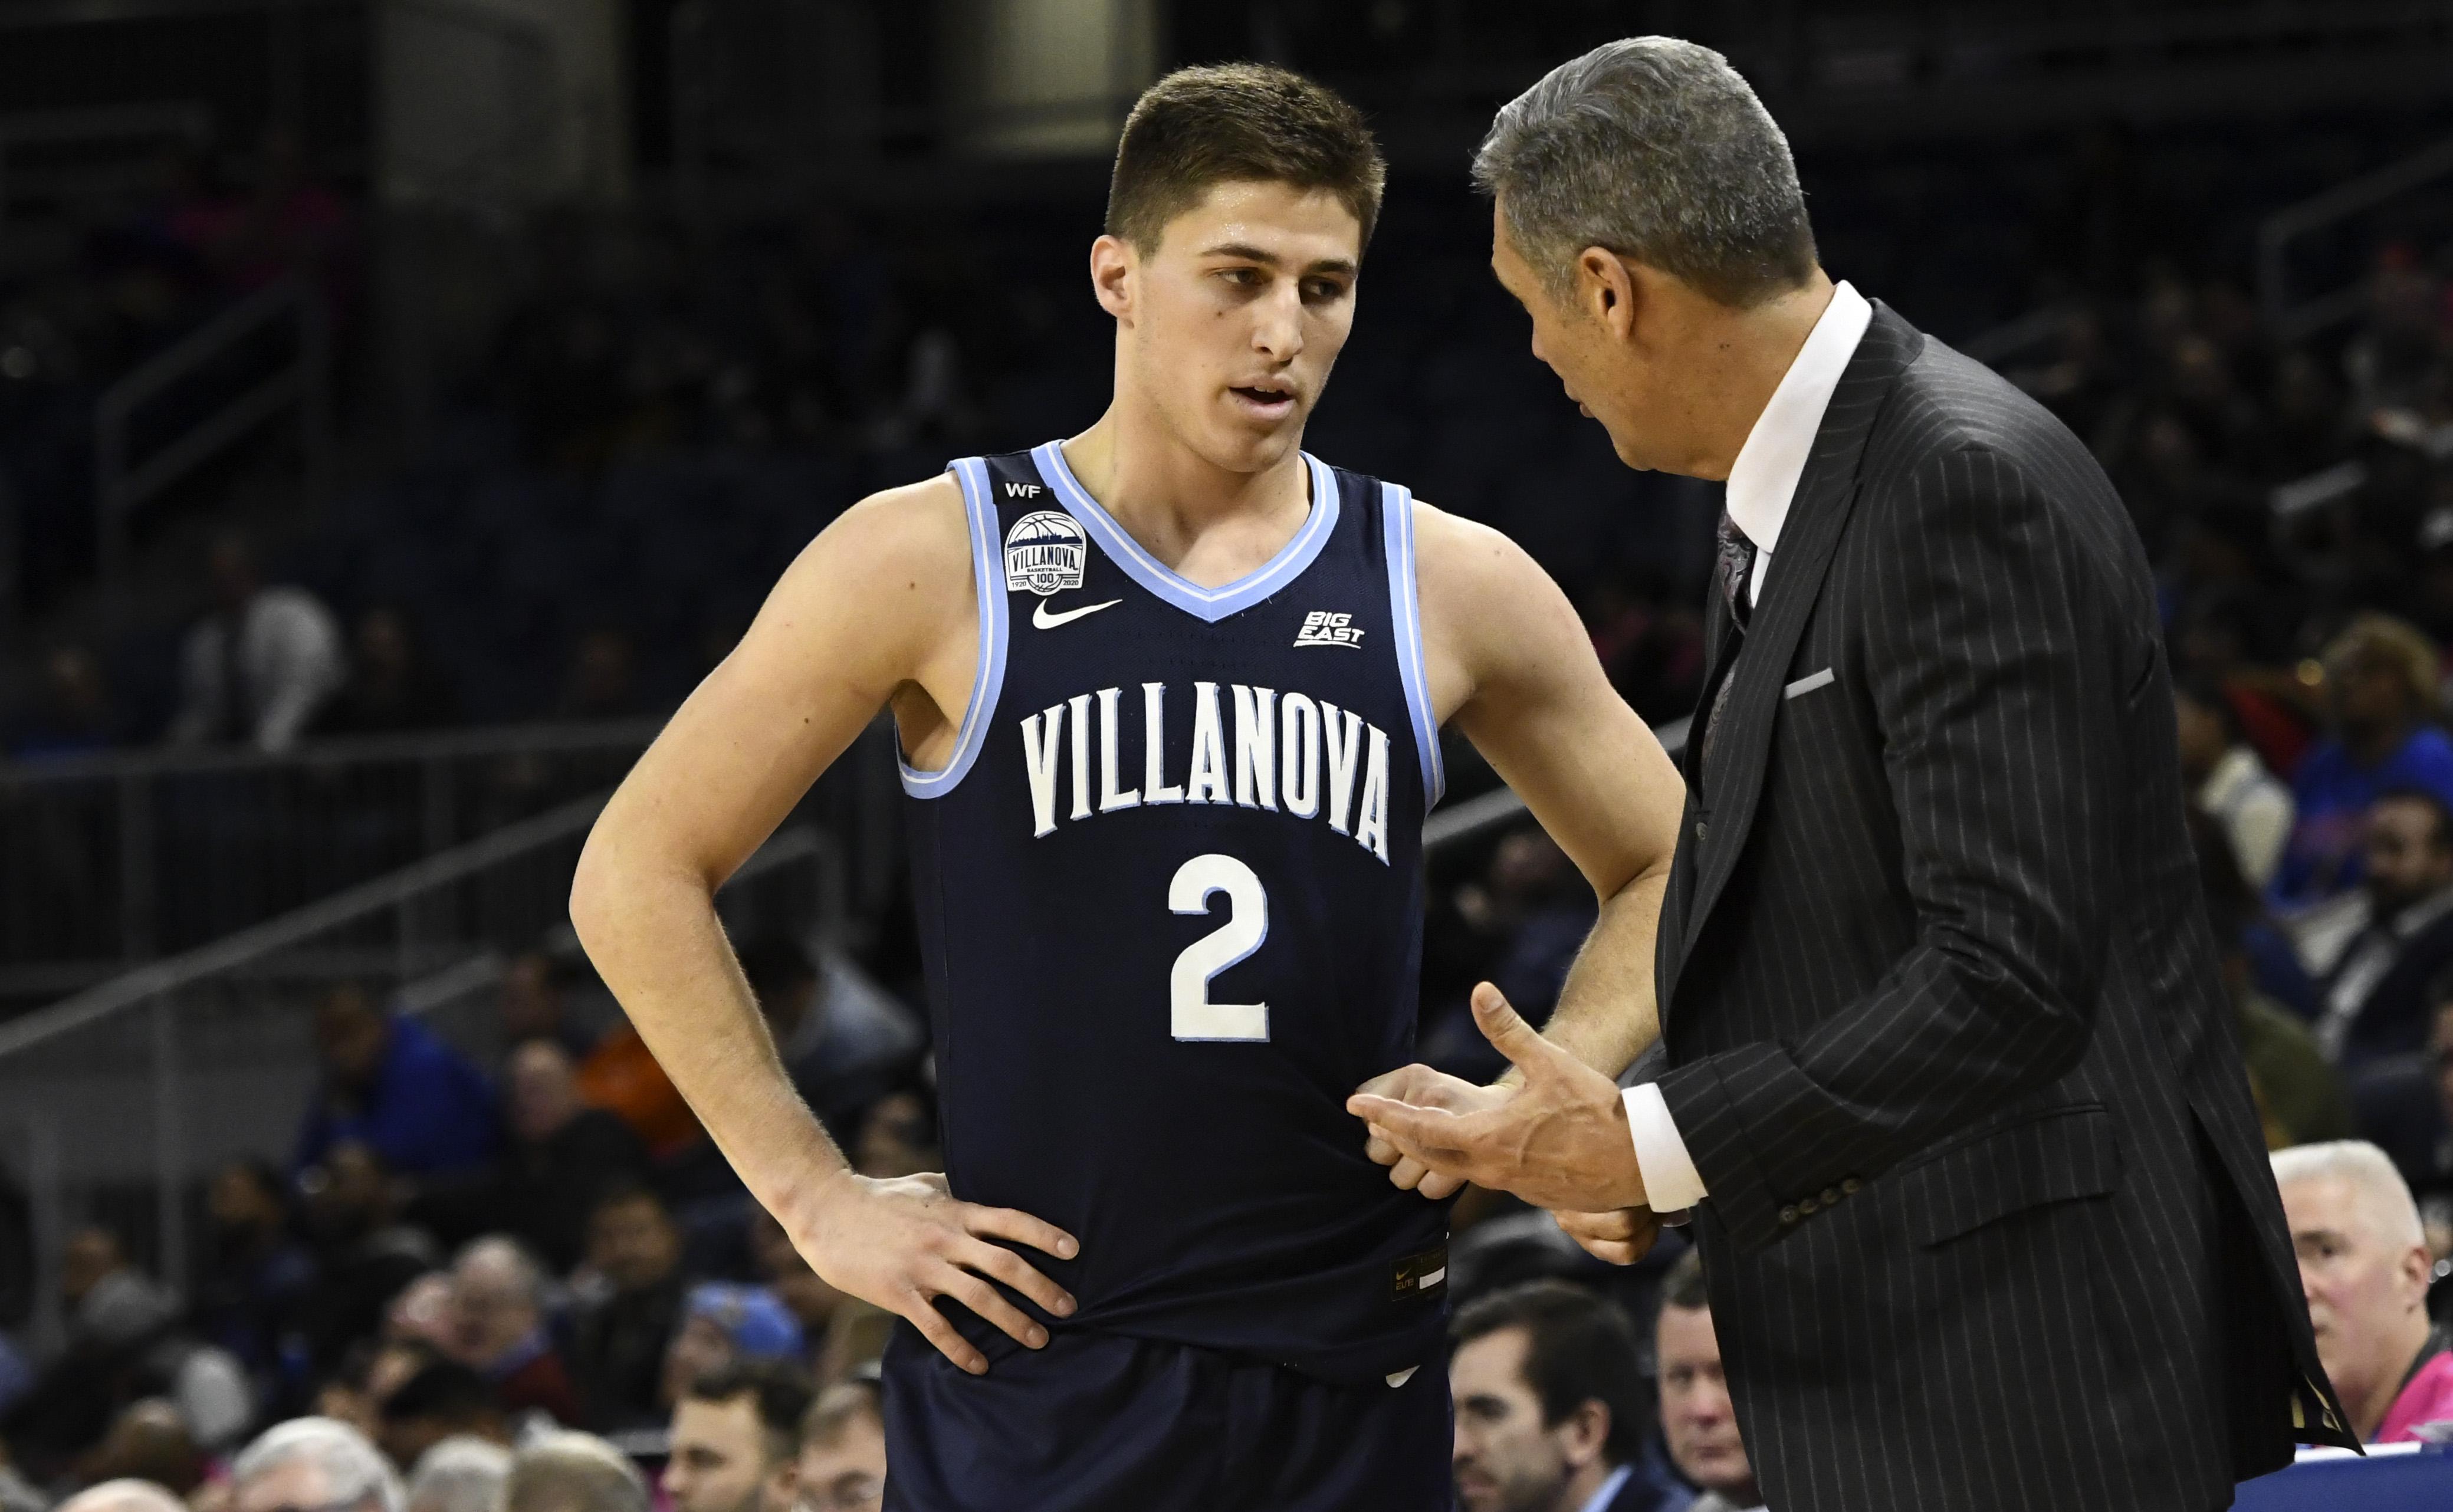 NCAA Basketball: Villanova at DePaul